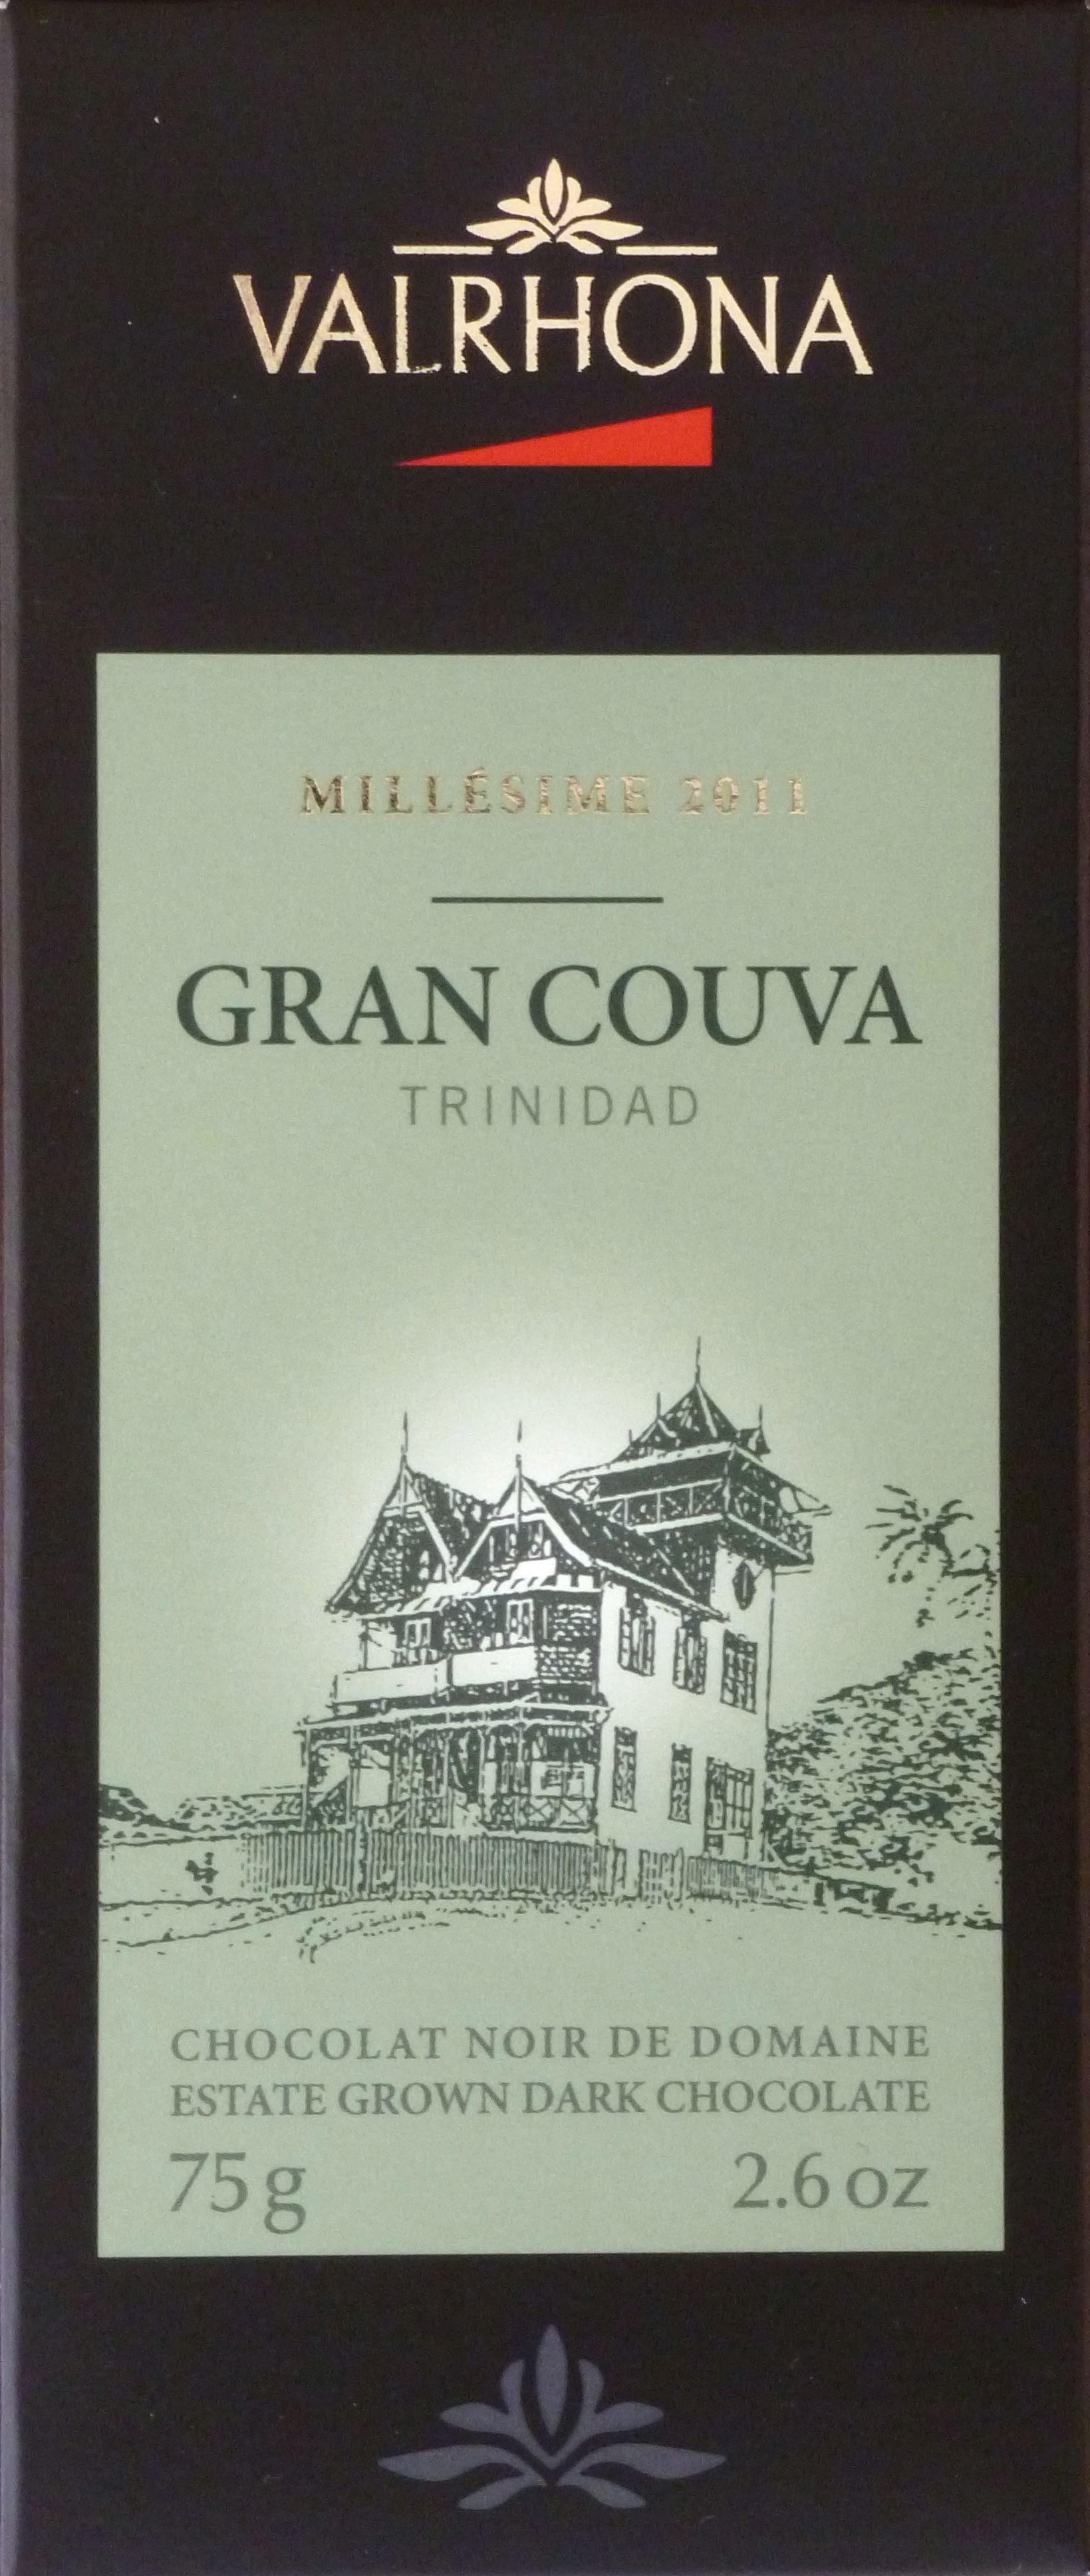 Valrhona Gran Couva: Trinitario, Trinidad